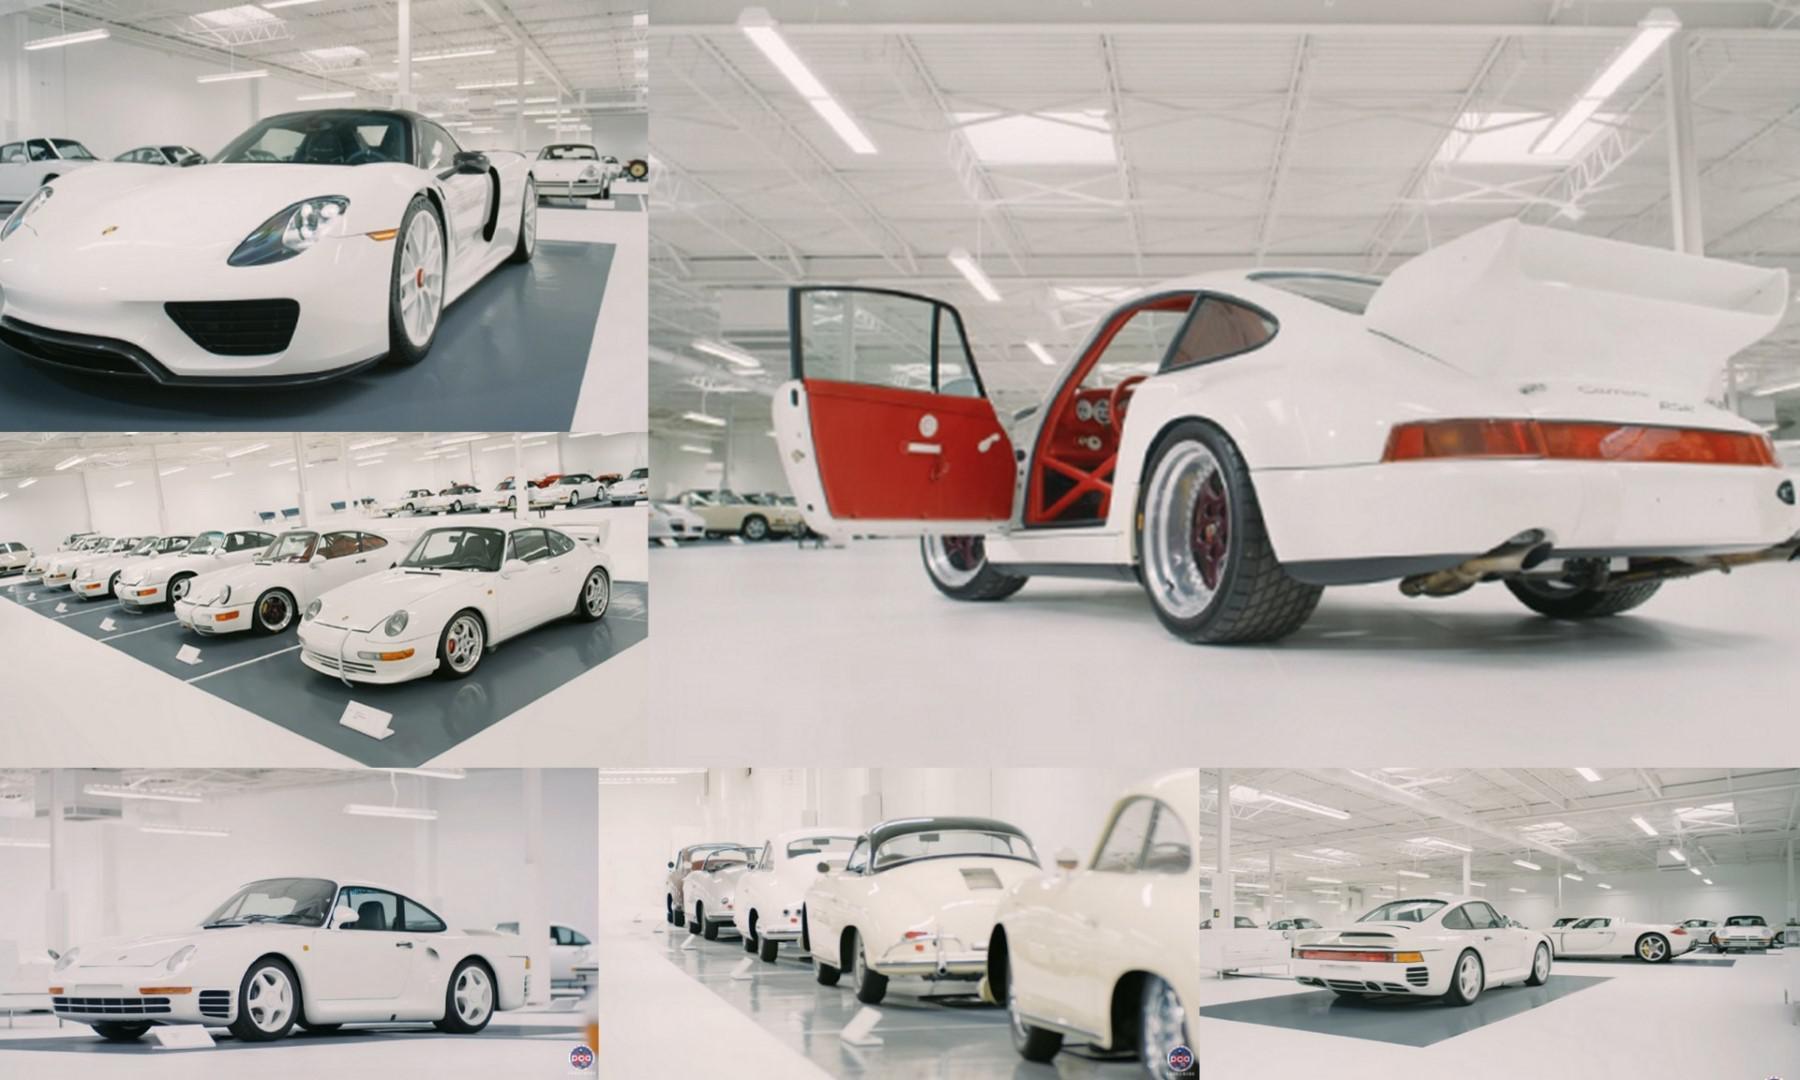 The White Collection: Porsche Club of America